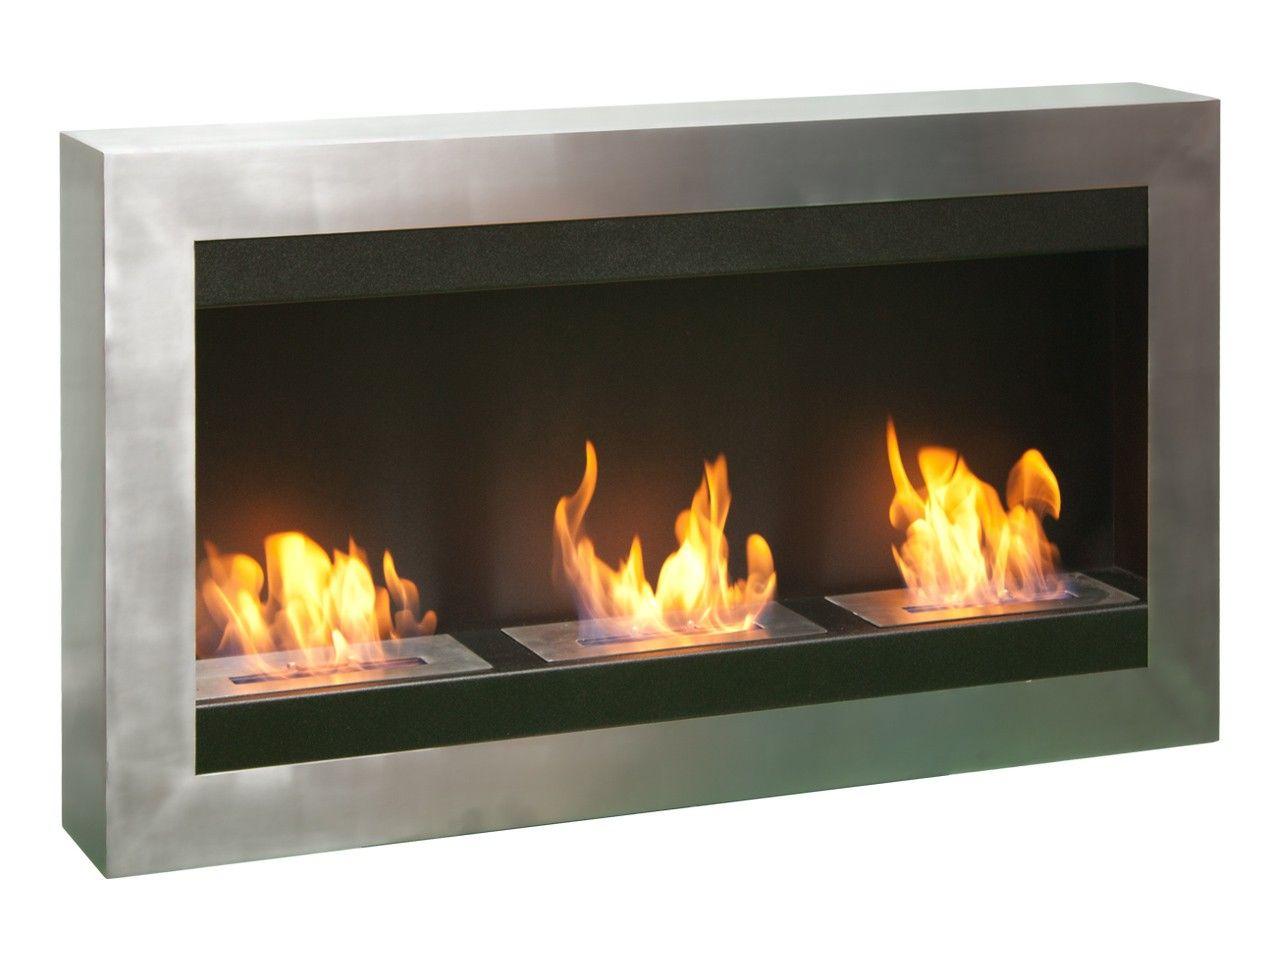 Quadra Magnum  Wall Mounted Fireplace  $1,044